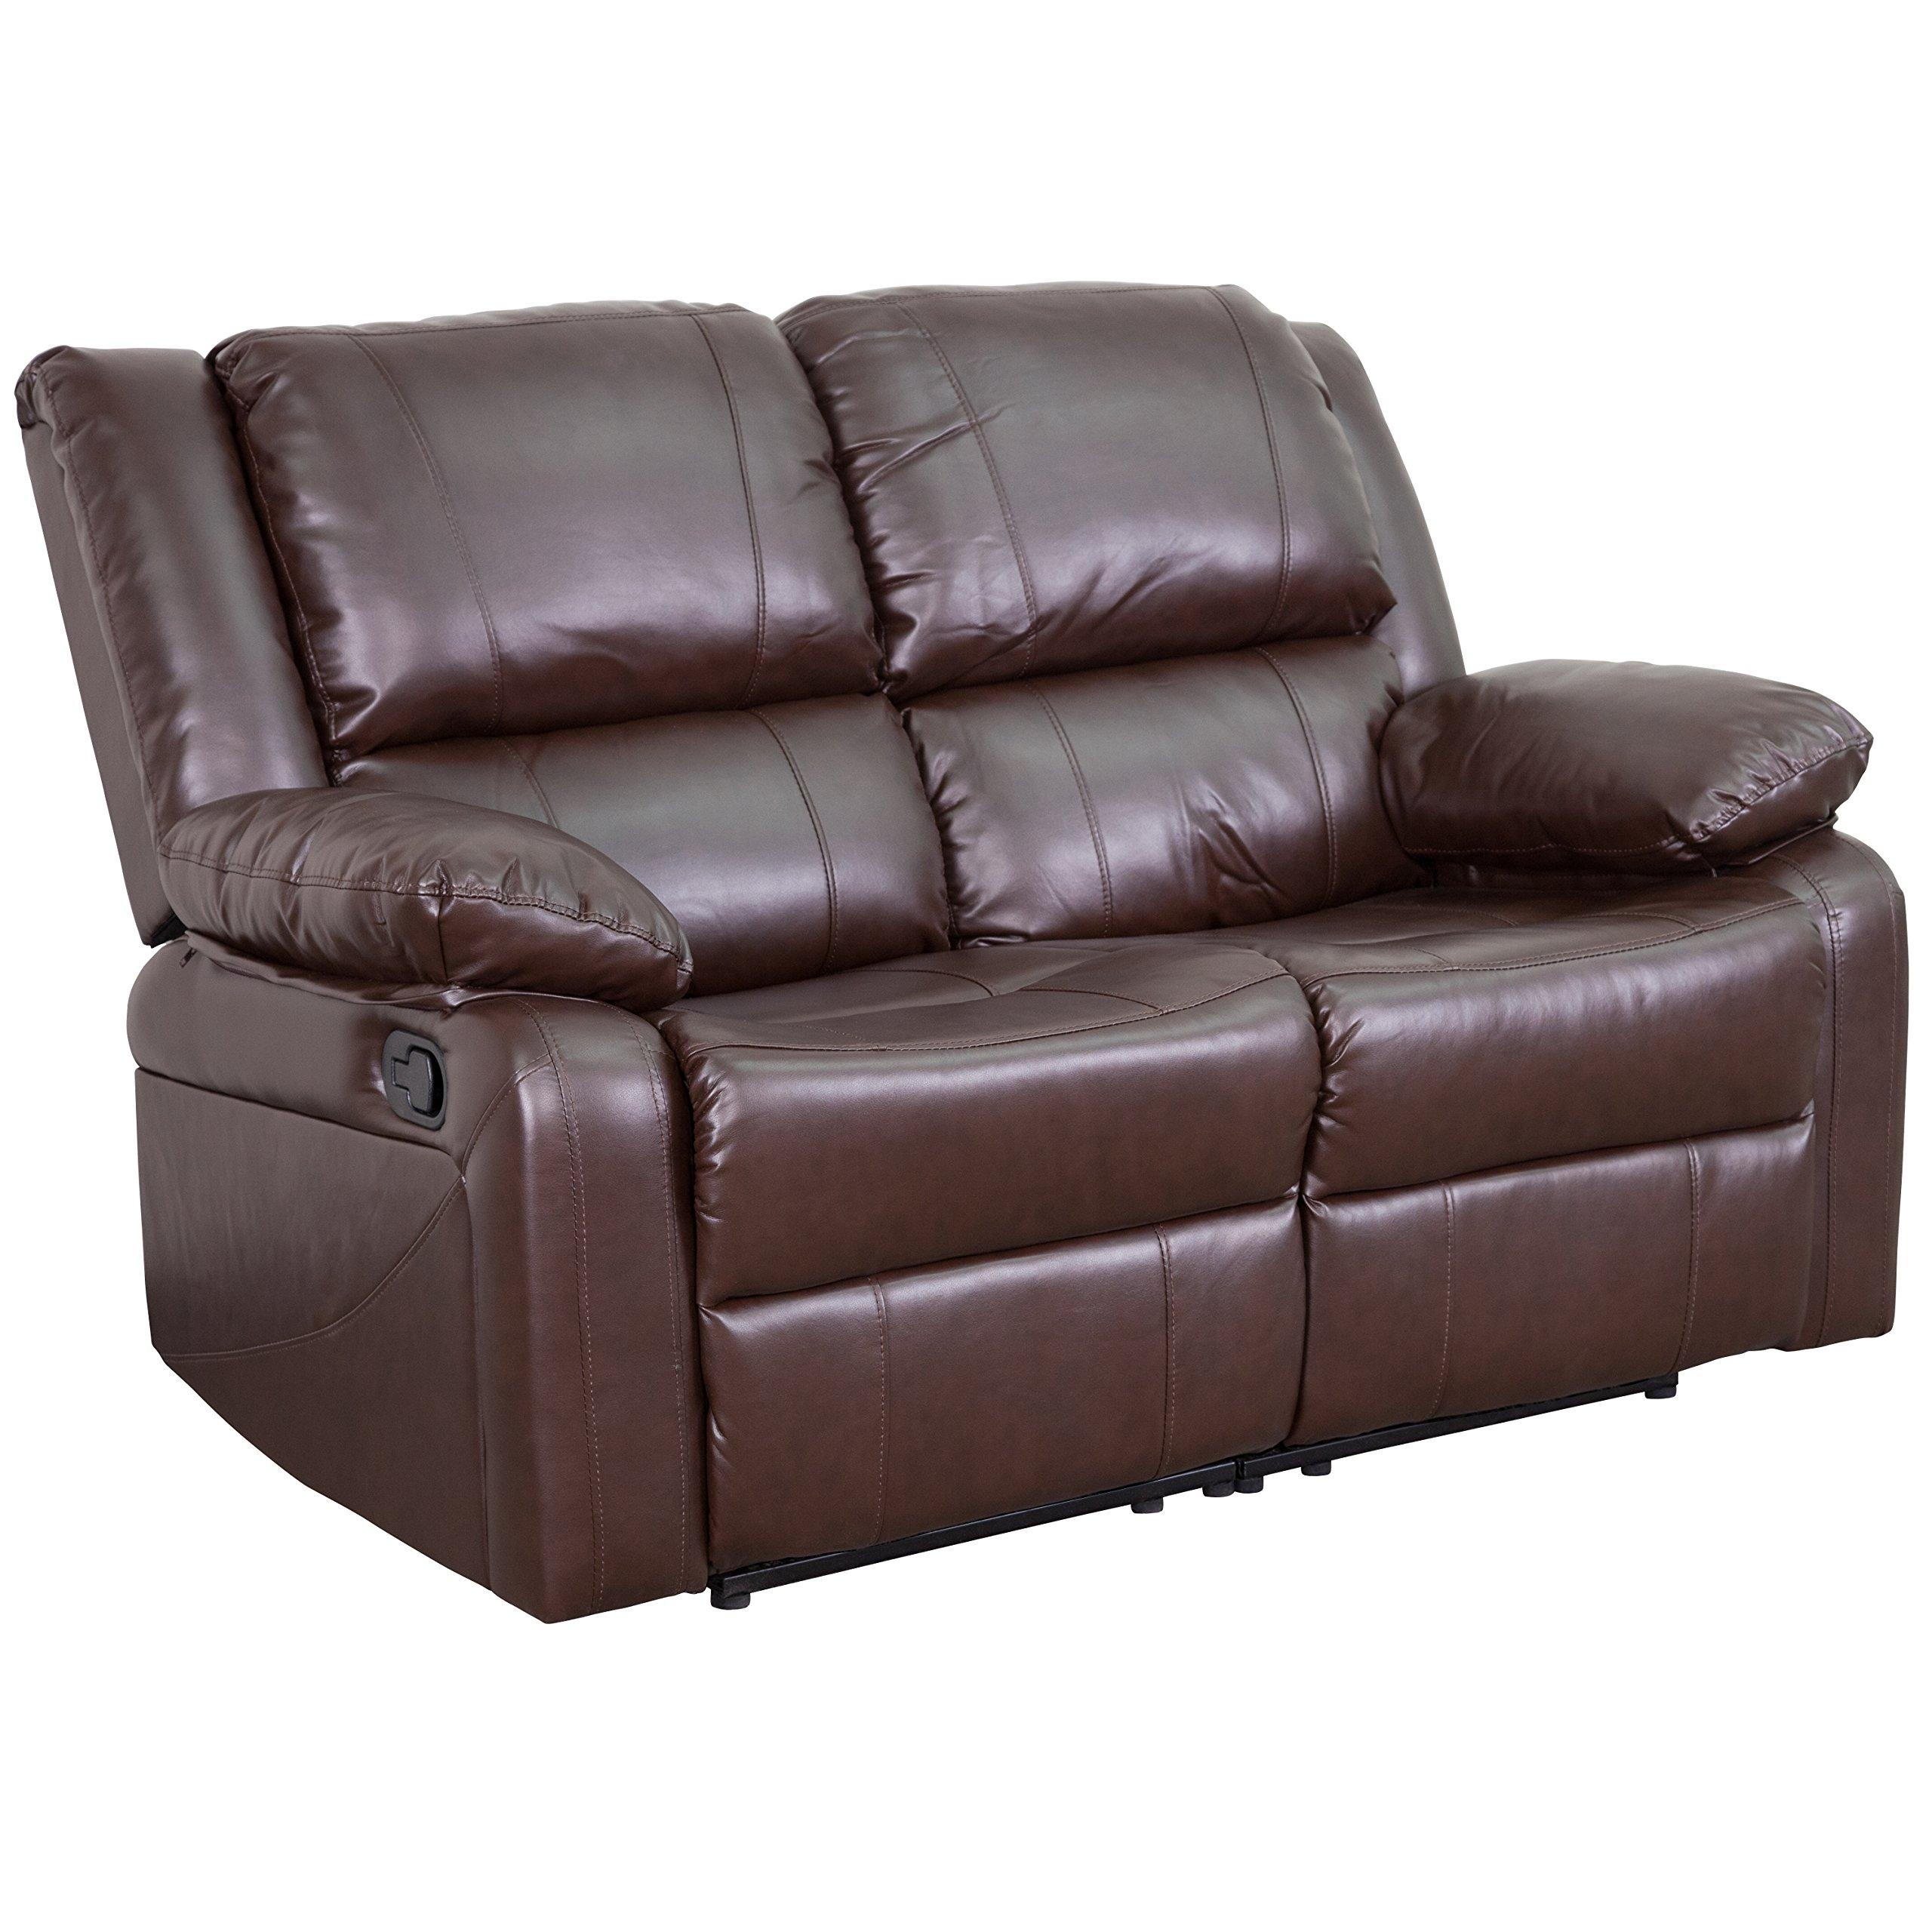 Flash Furniture Harmony Loveseat Recliners